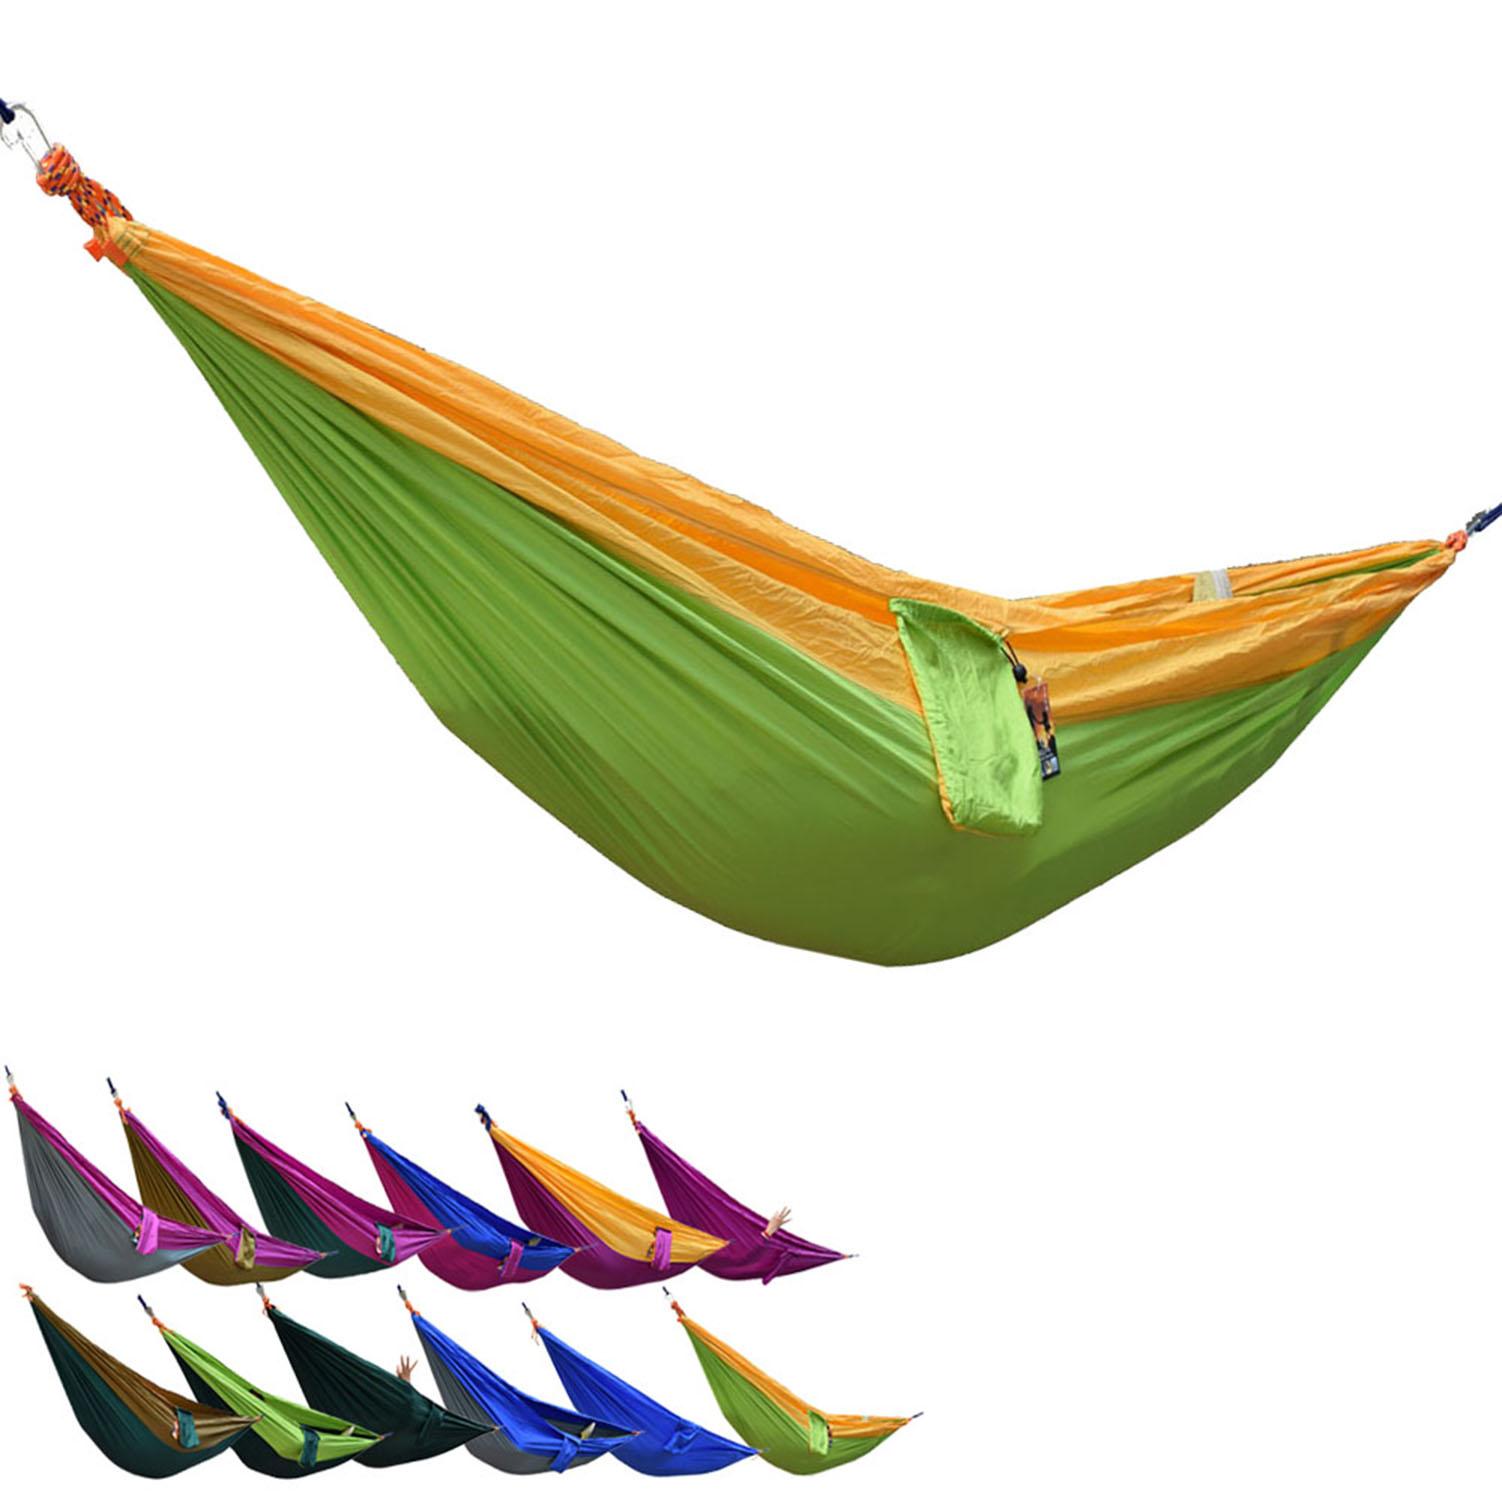 Portable Parachute Nylon Fabric Outdoor Travel Camping Hammock(China (Mainland))